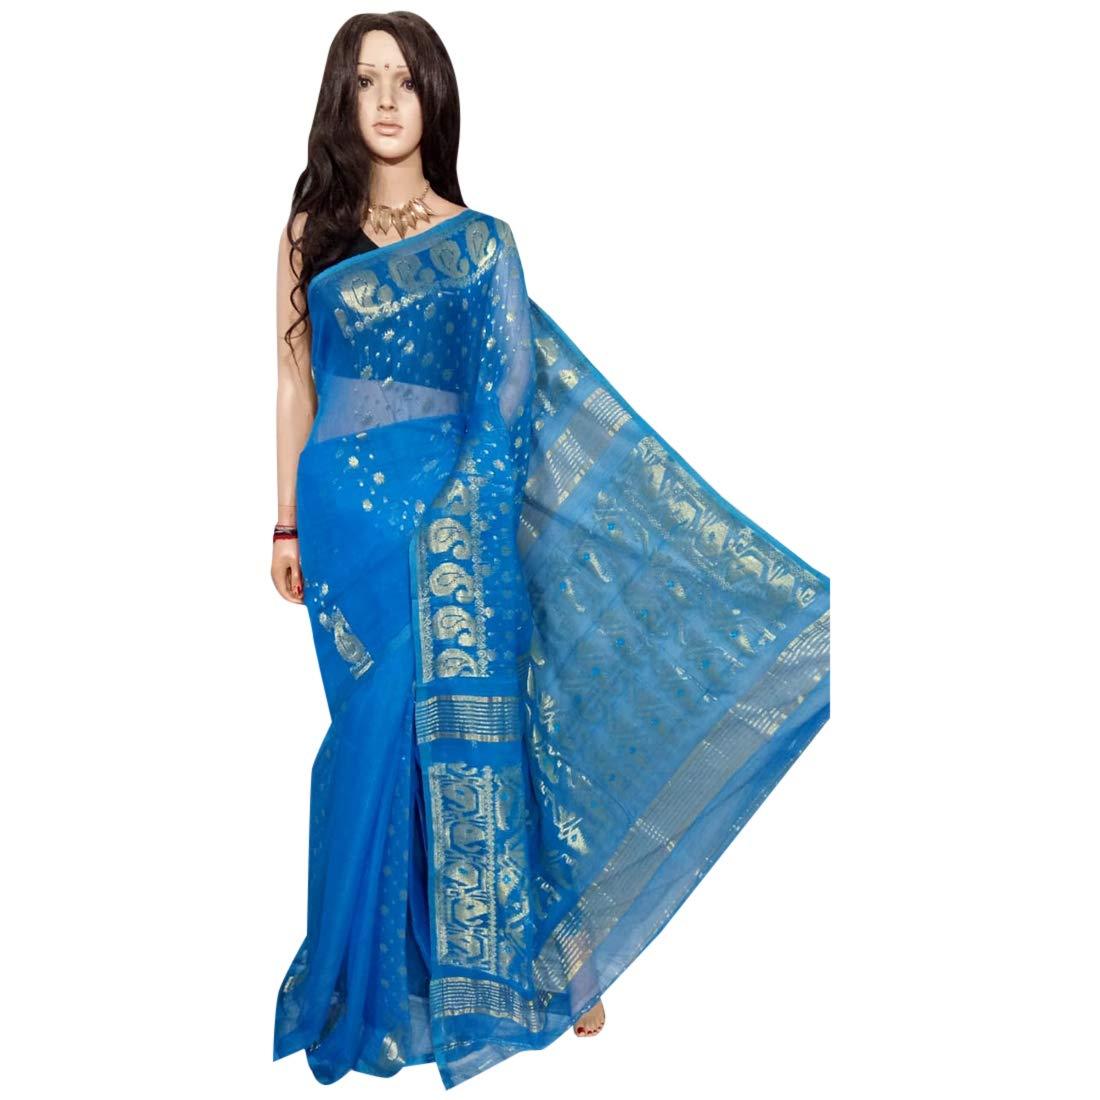 Indian Ethnic Handloom bluee Zari work Zamdani Saree Party Women Wear Sari 101a